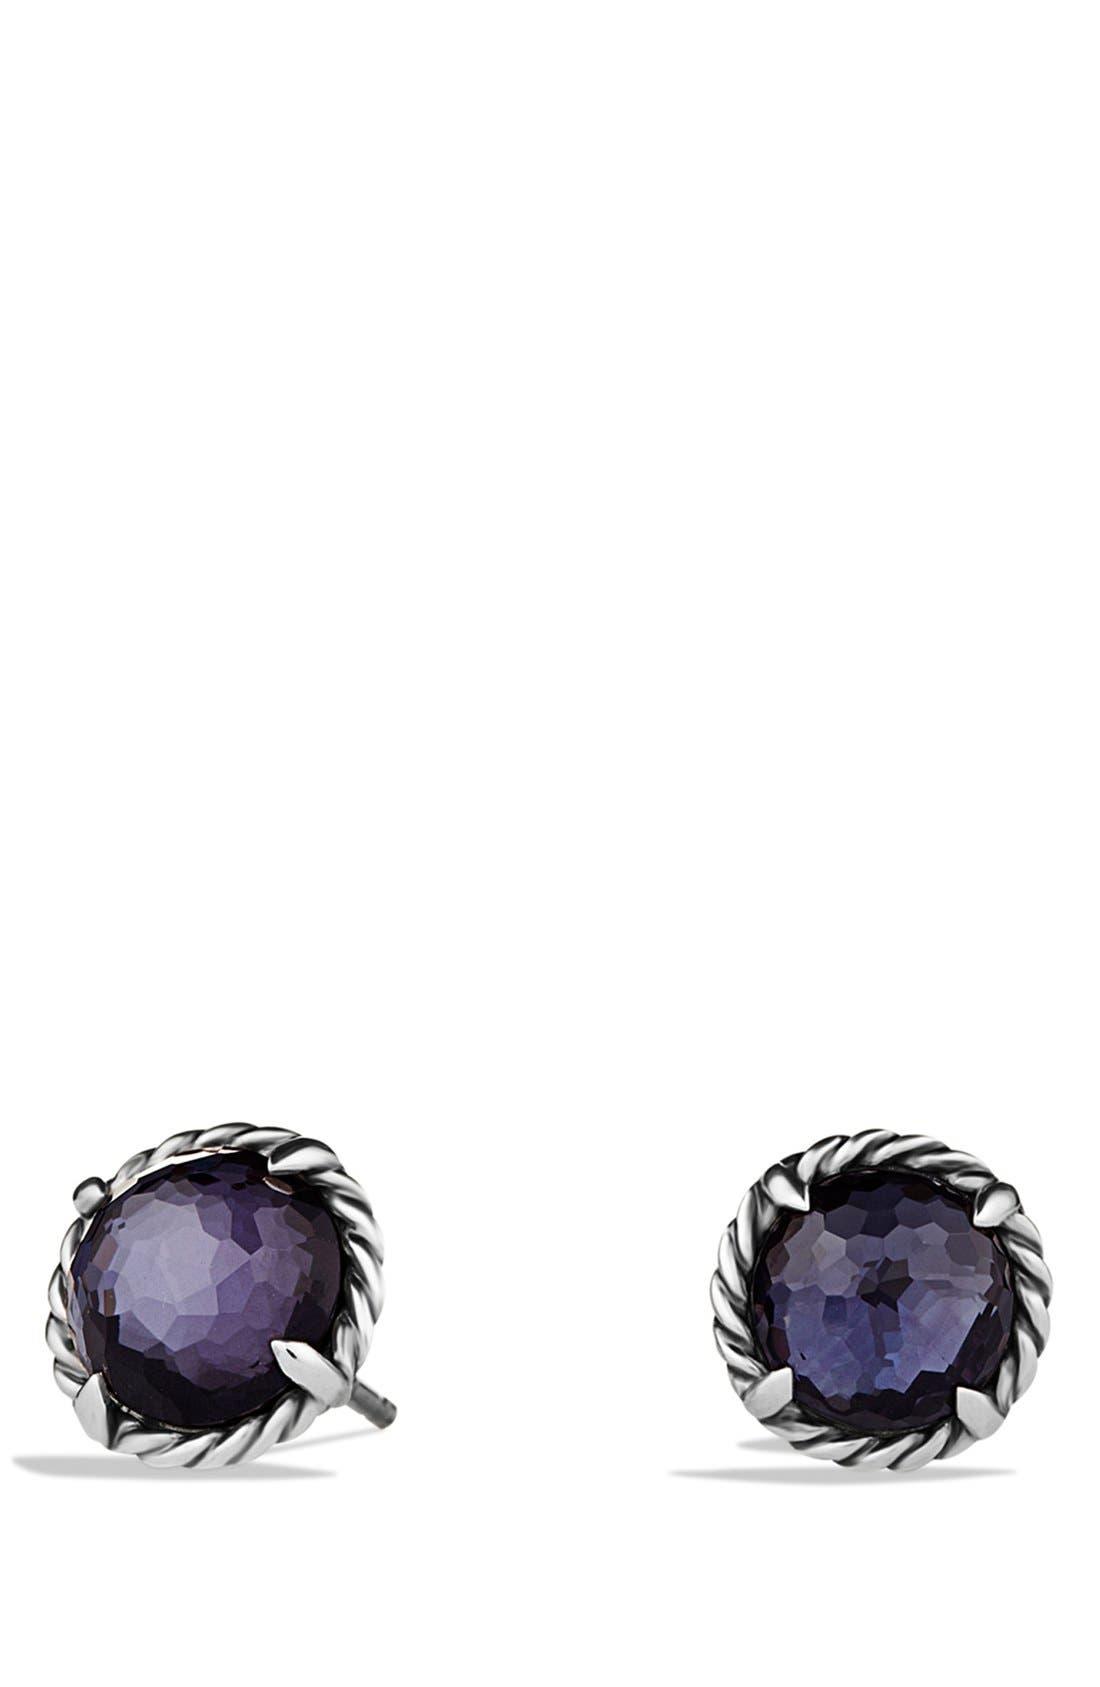 'Châtelaine' Earrings,                             Main thumbnail 1, color,                             Black Orchid